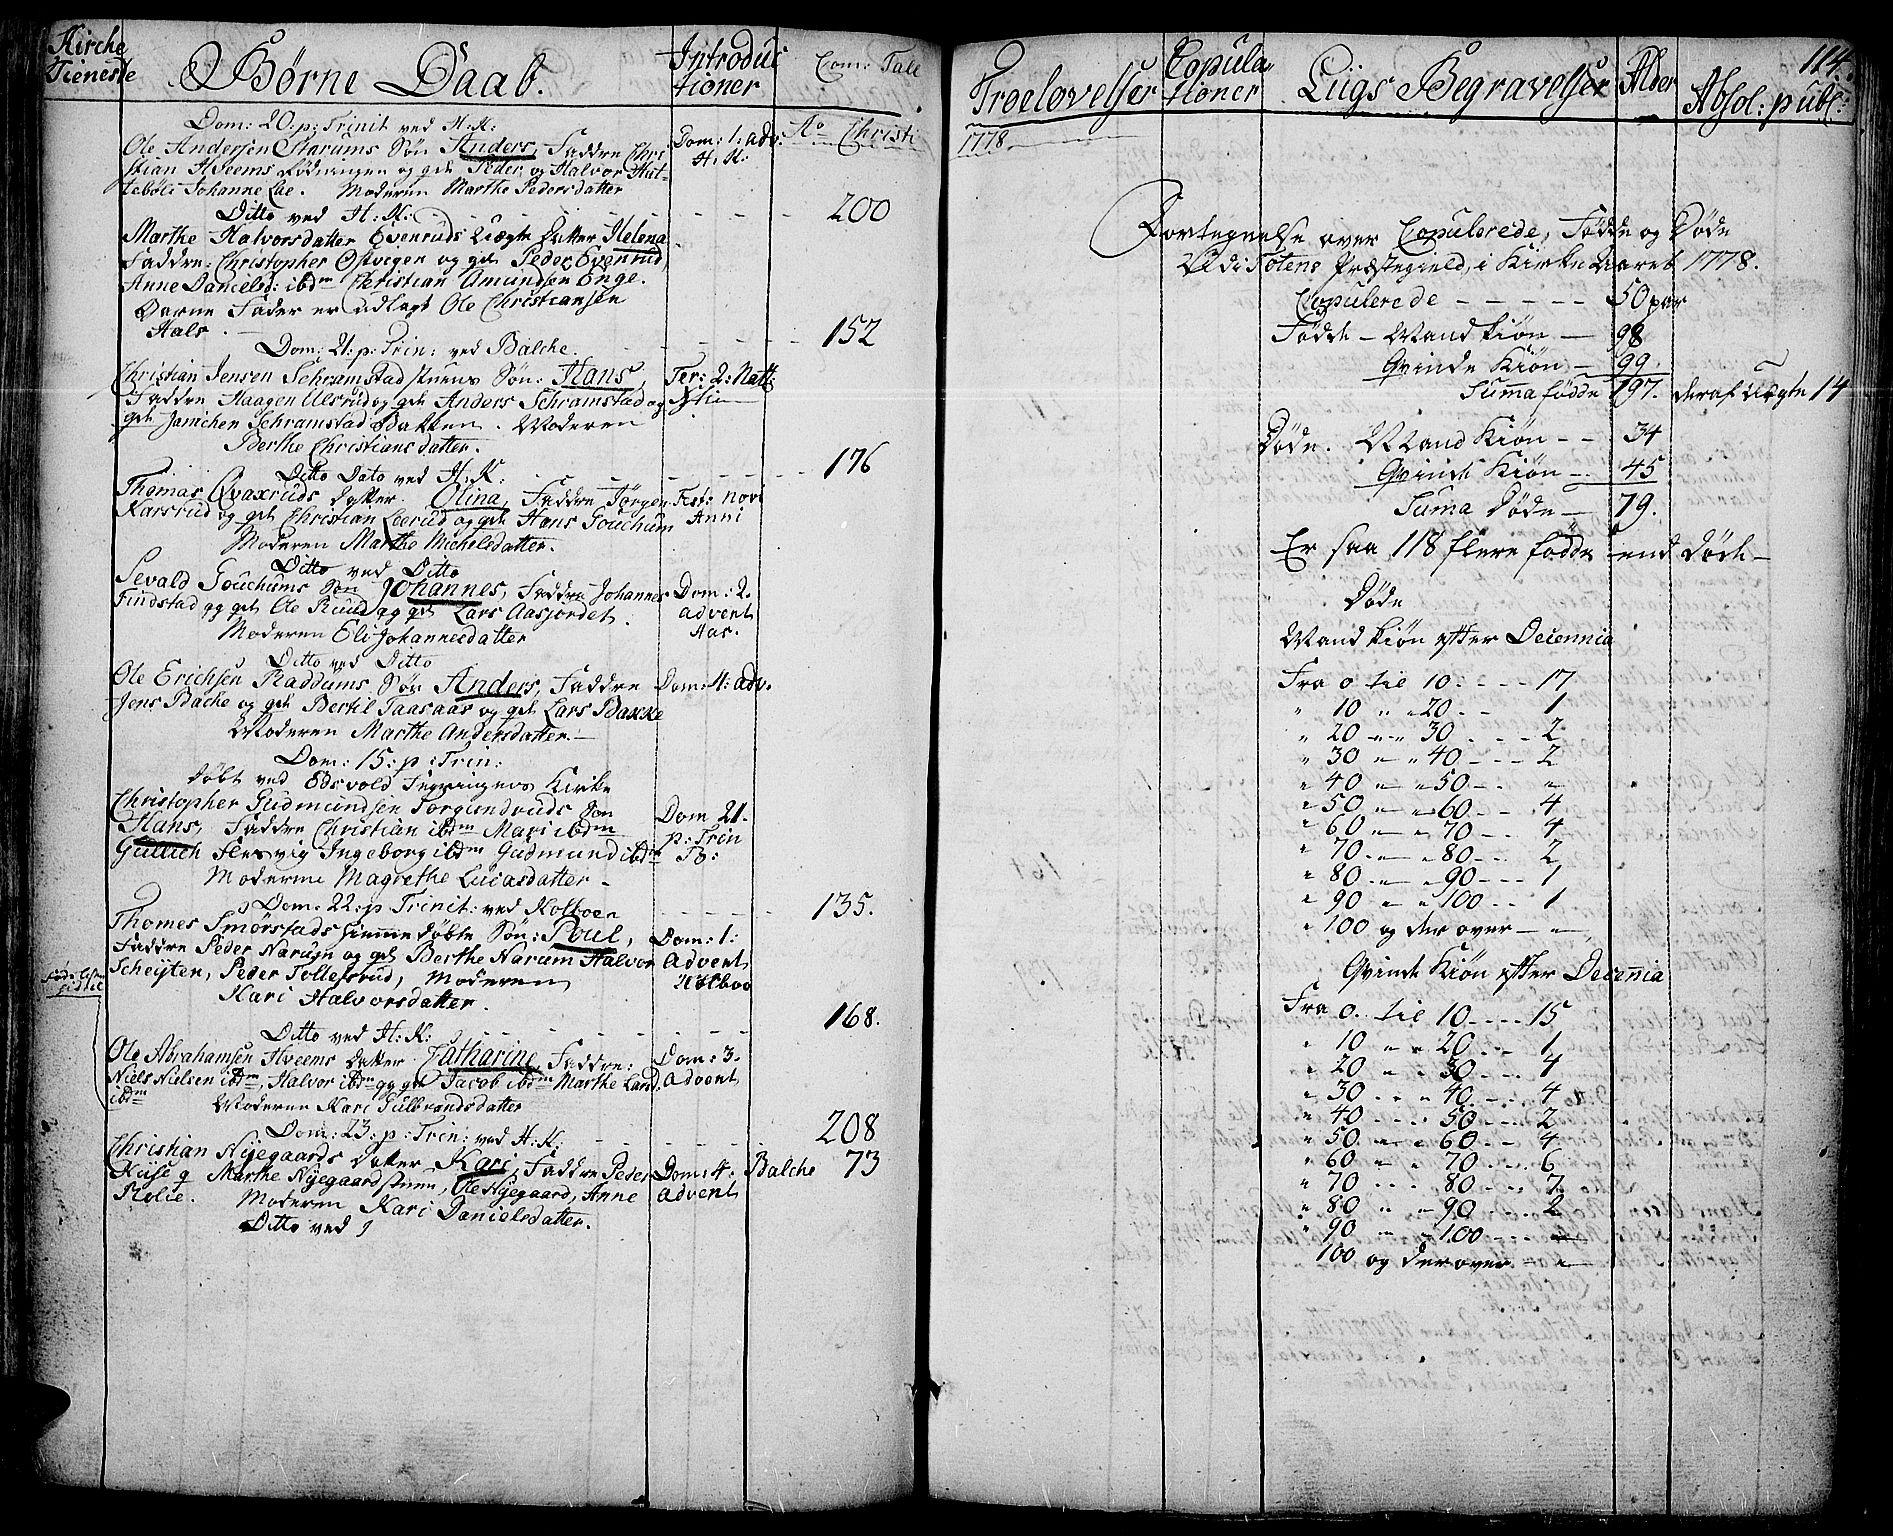 SAH, Toten prestekontor, Ministerialbok nr. 6, 1773-1793, s. 114